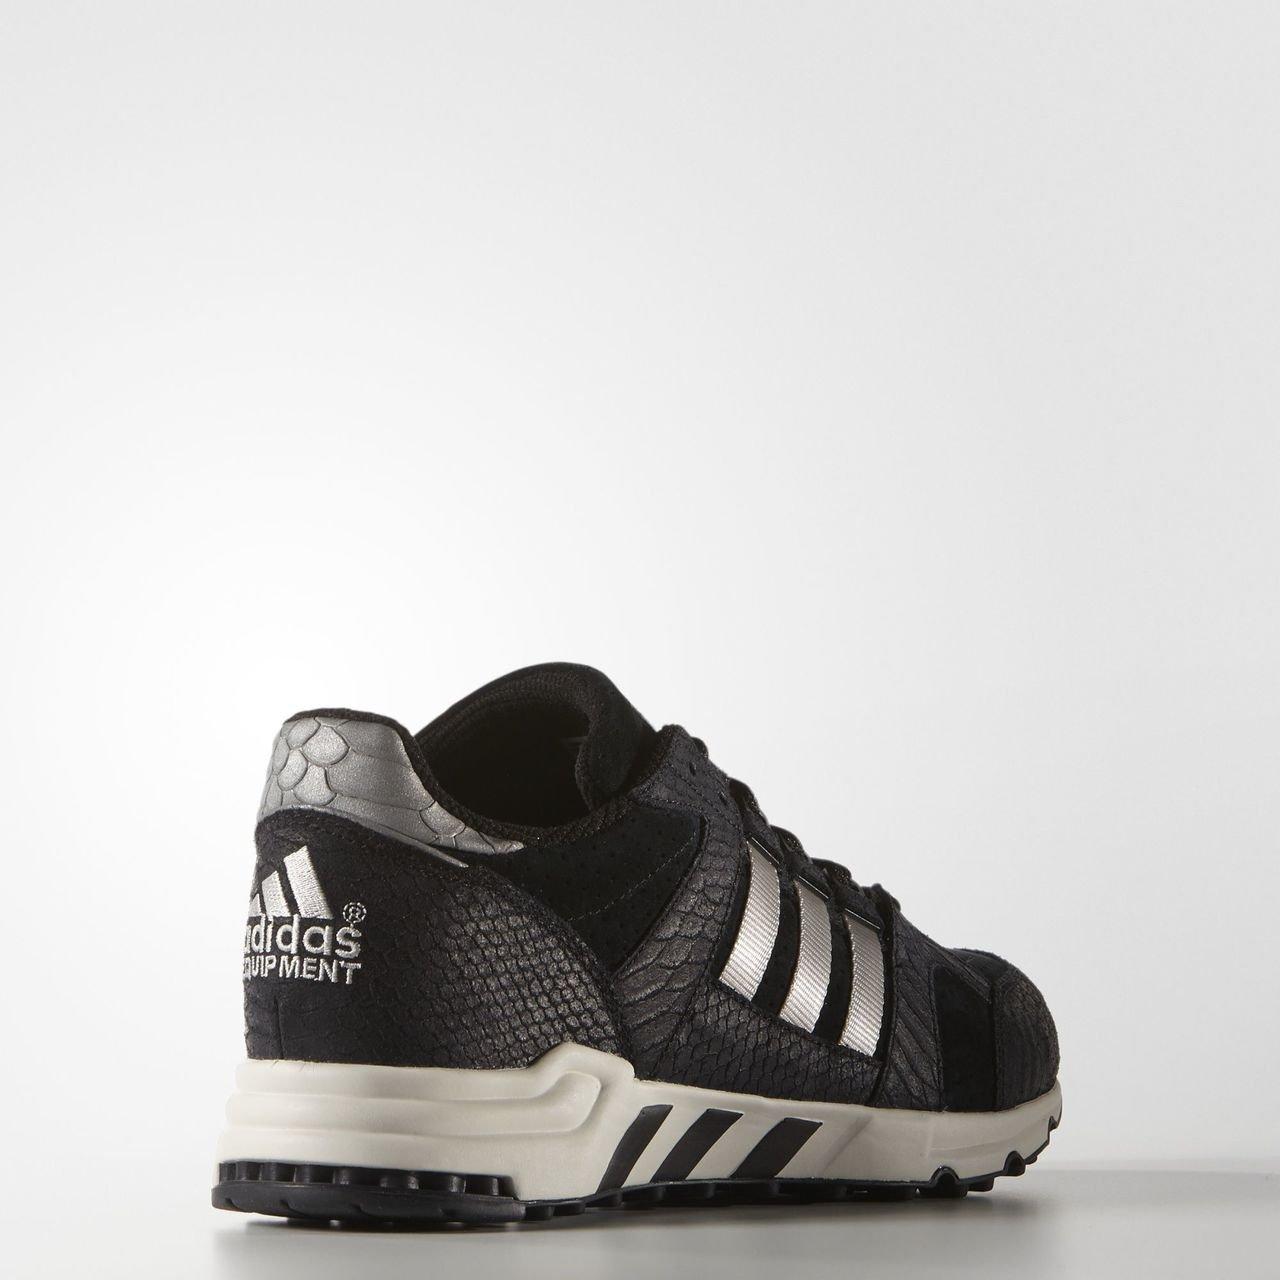 Adidas Equipment Running Running Running Support B01EZ1QQRK 37 EU nero   Metallic argento | Commercio All'ingrosso  | Un equilibrio tra robustezza e durezza  | Clienti In Primo Luogo  | Sconto  | Sale Online  | Negozio  8227ab